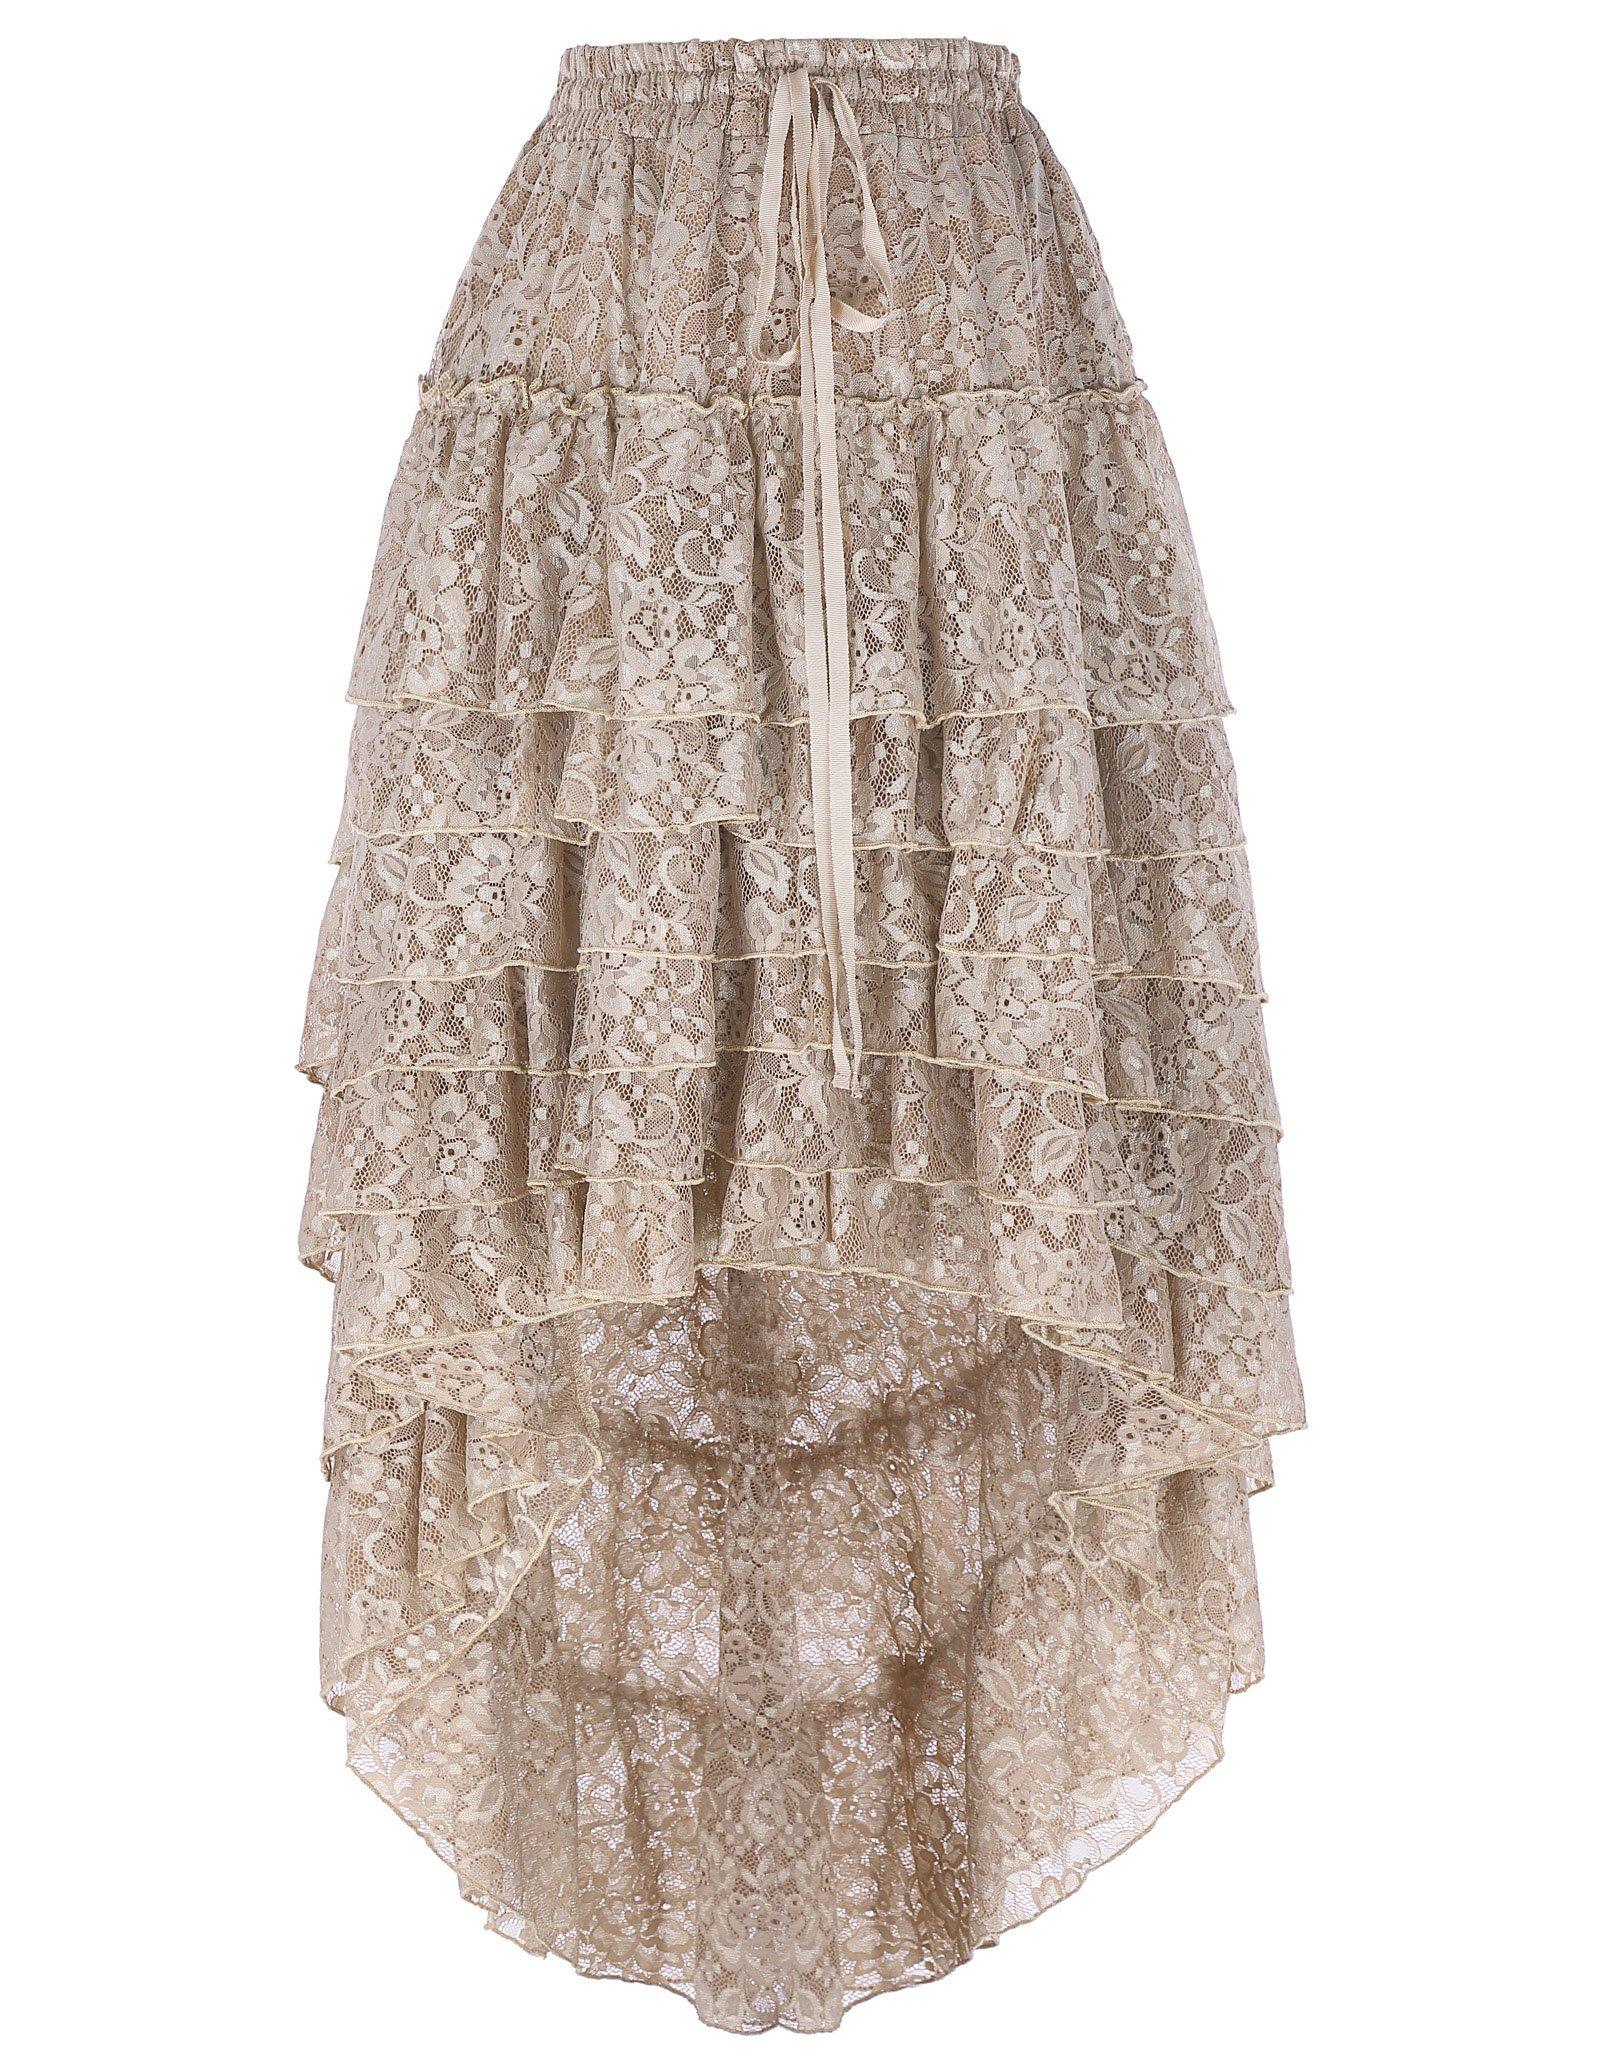 Belle Poque Women Victorian Gothic Skirt High Low Steampunk Accessories BP221-1 S